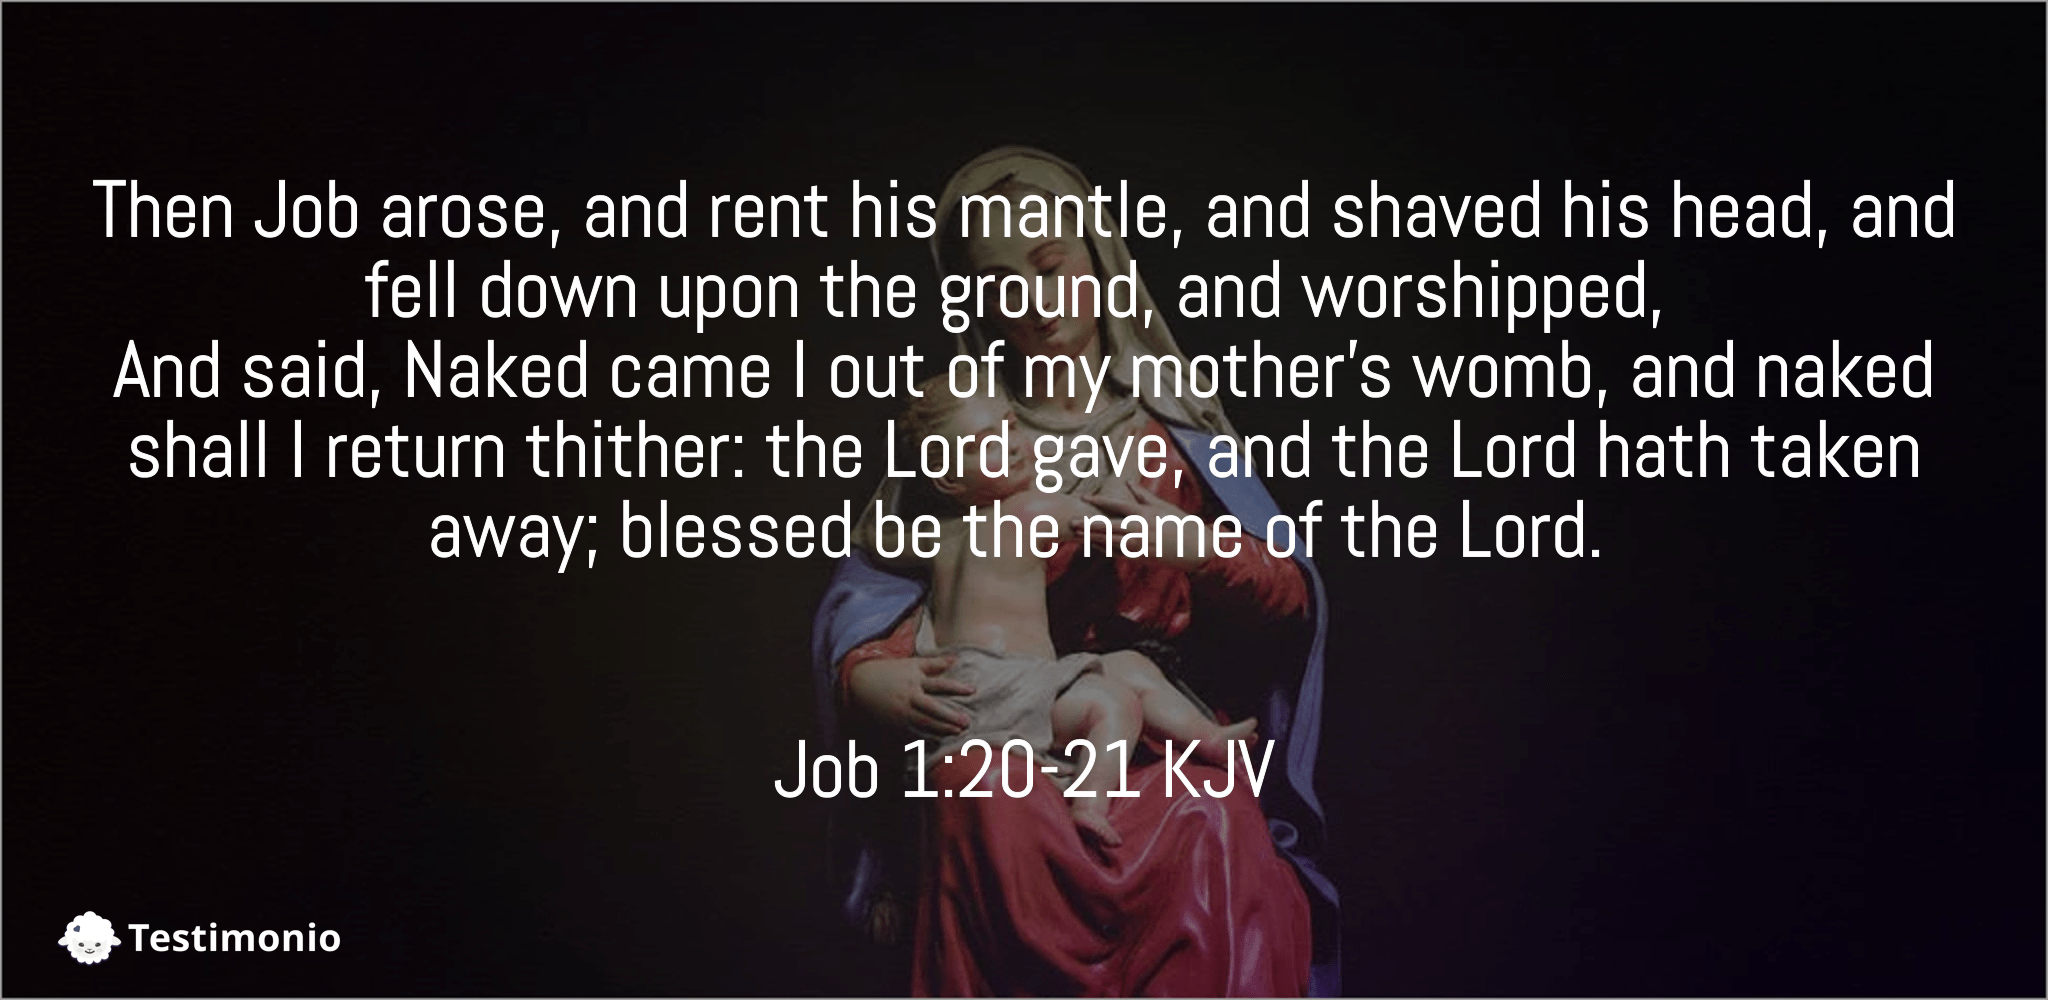 Job 1:20-21